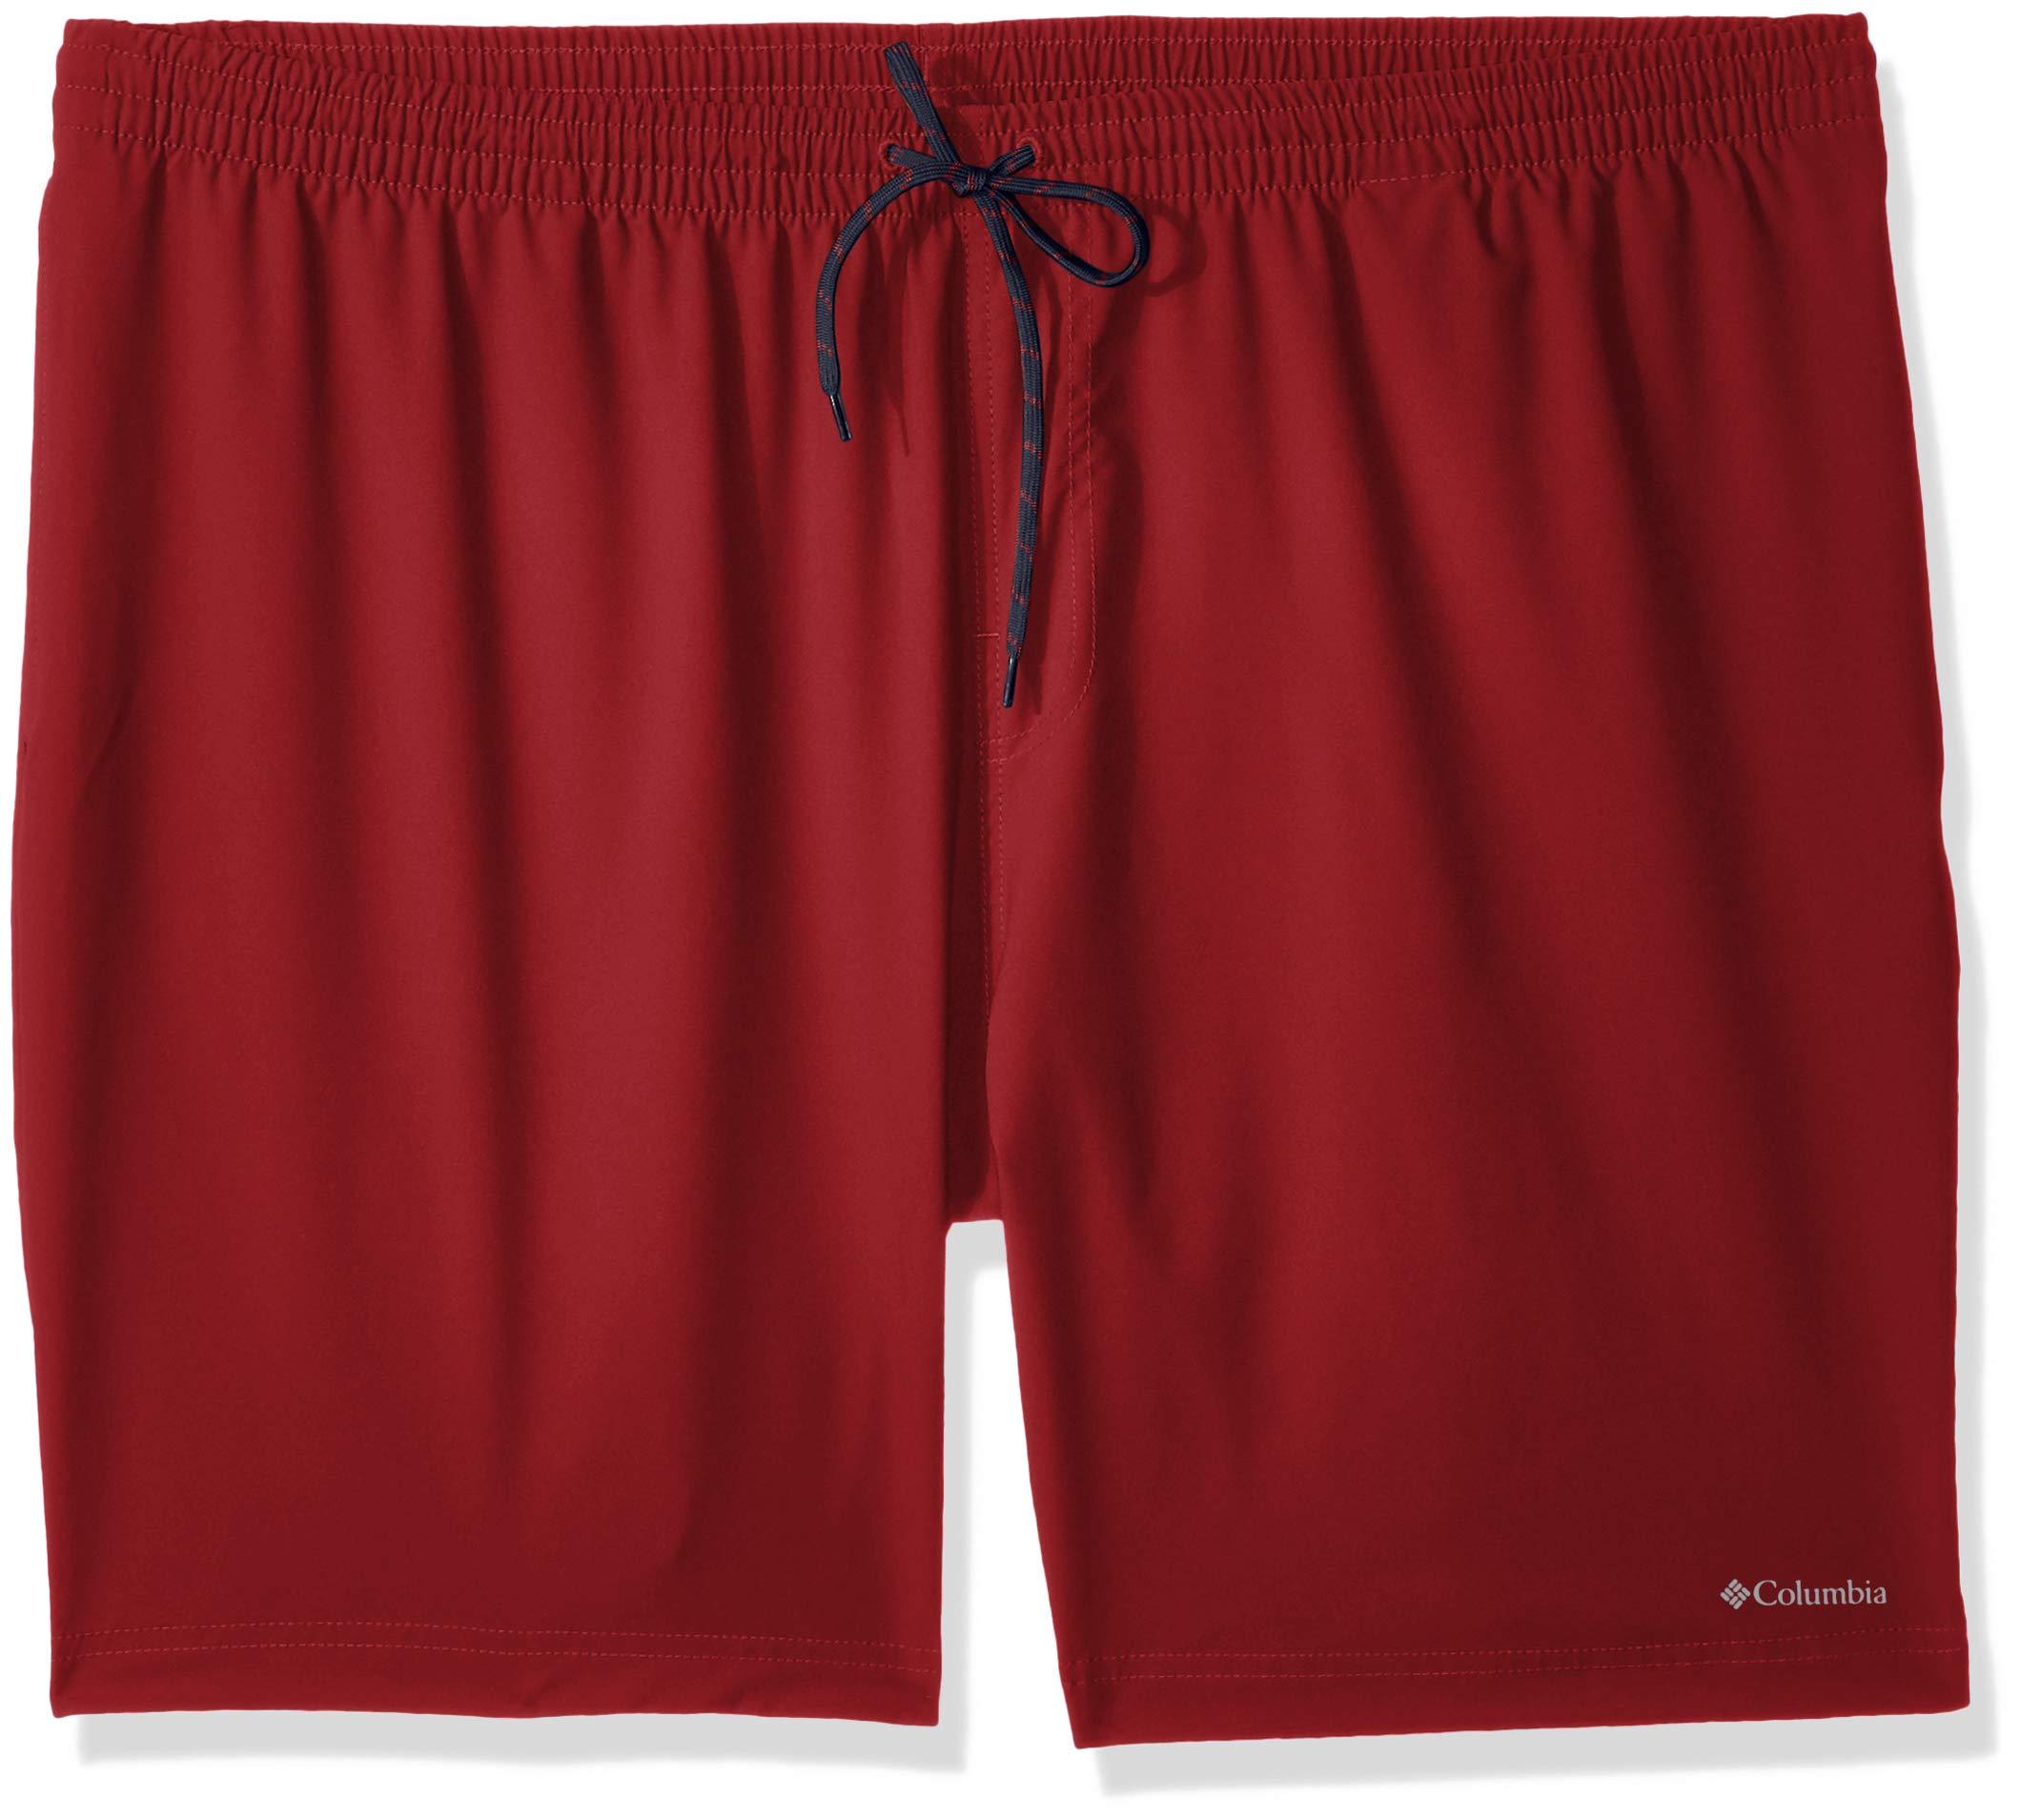 Columbia Men's Summertide Stretch Short-Big, red Element, 2Xx6